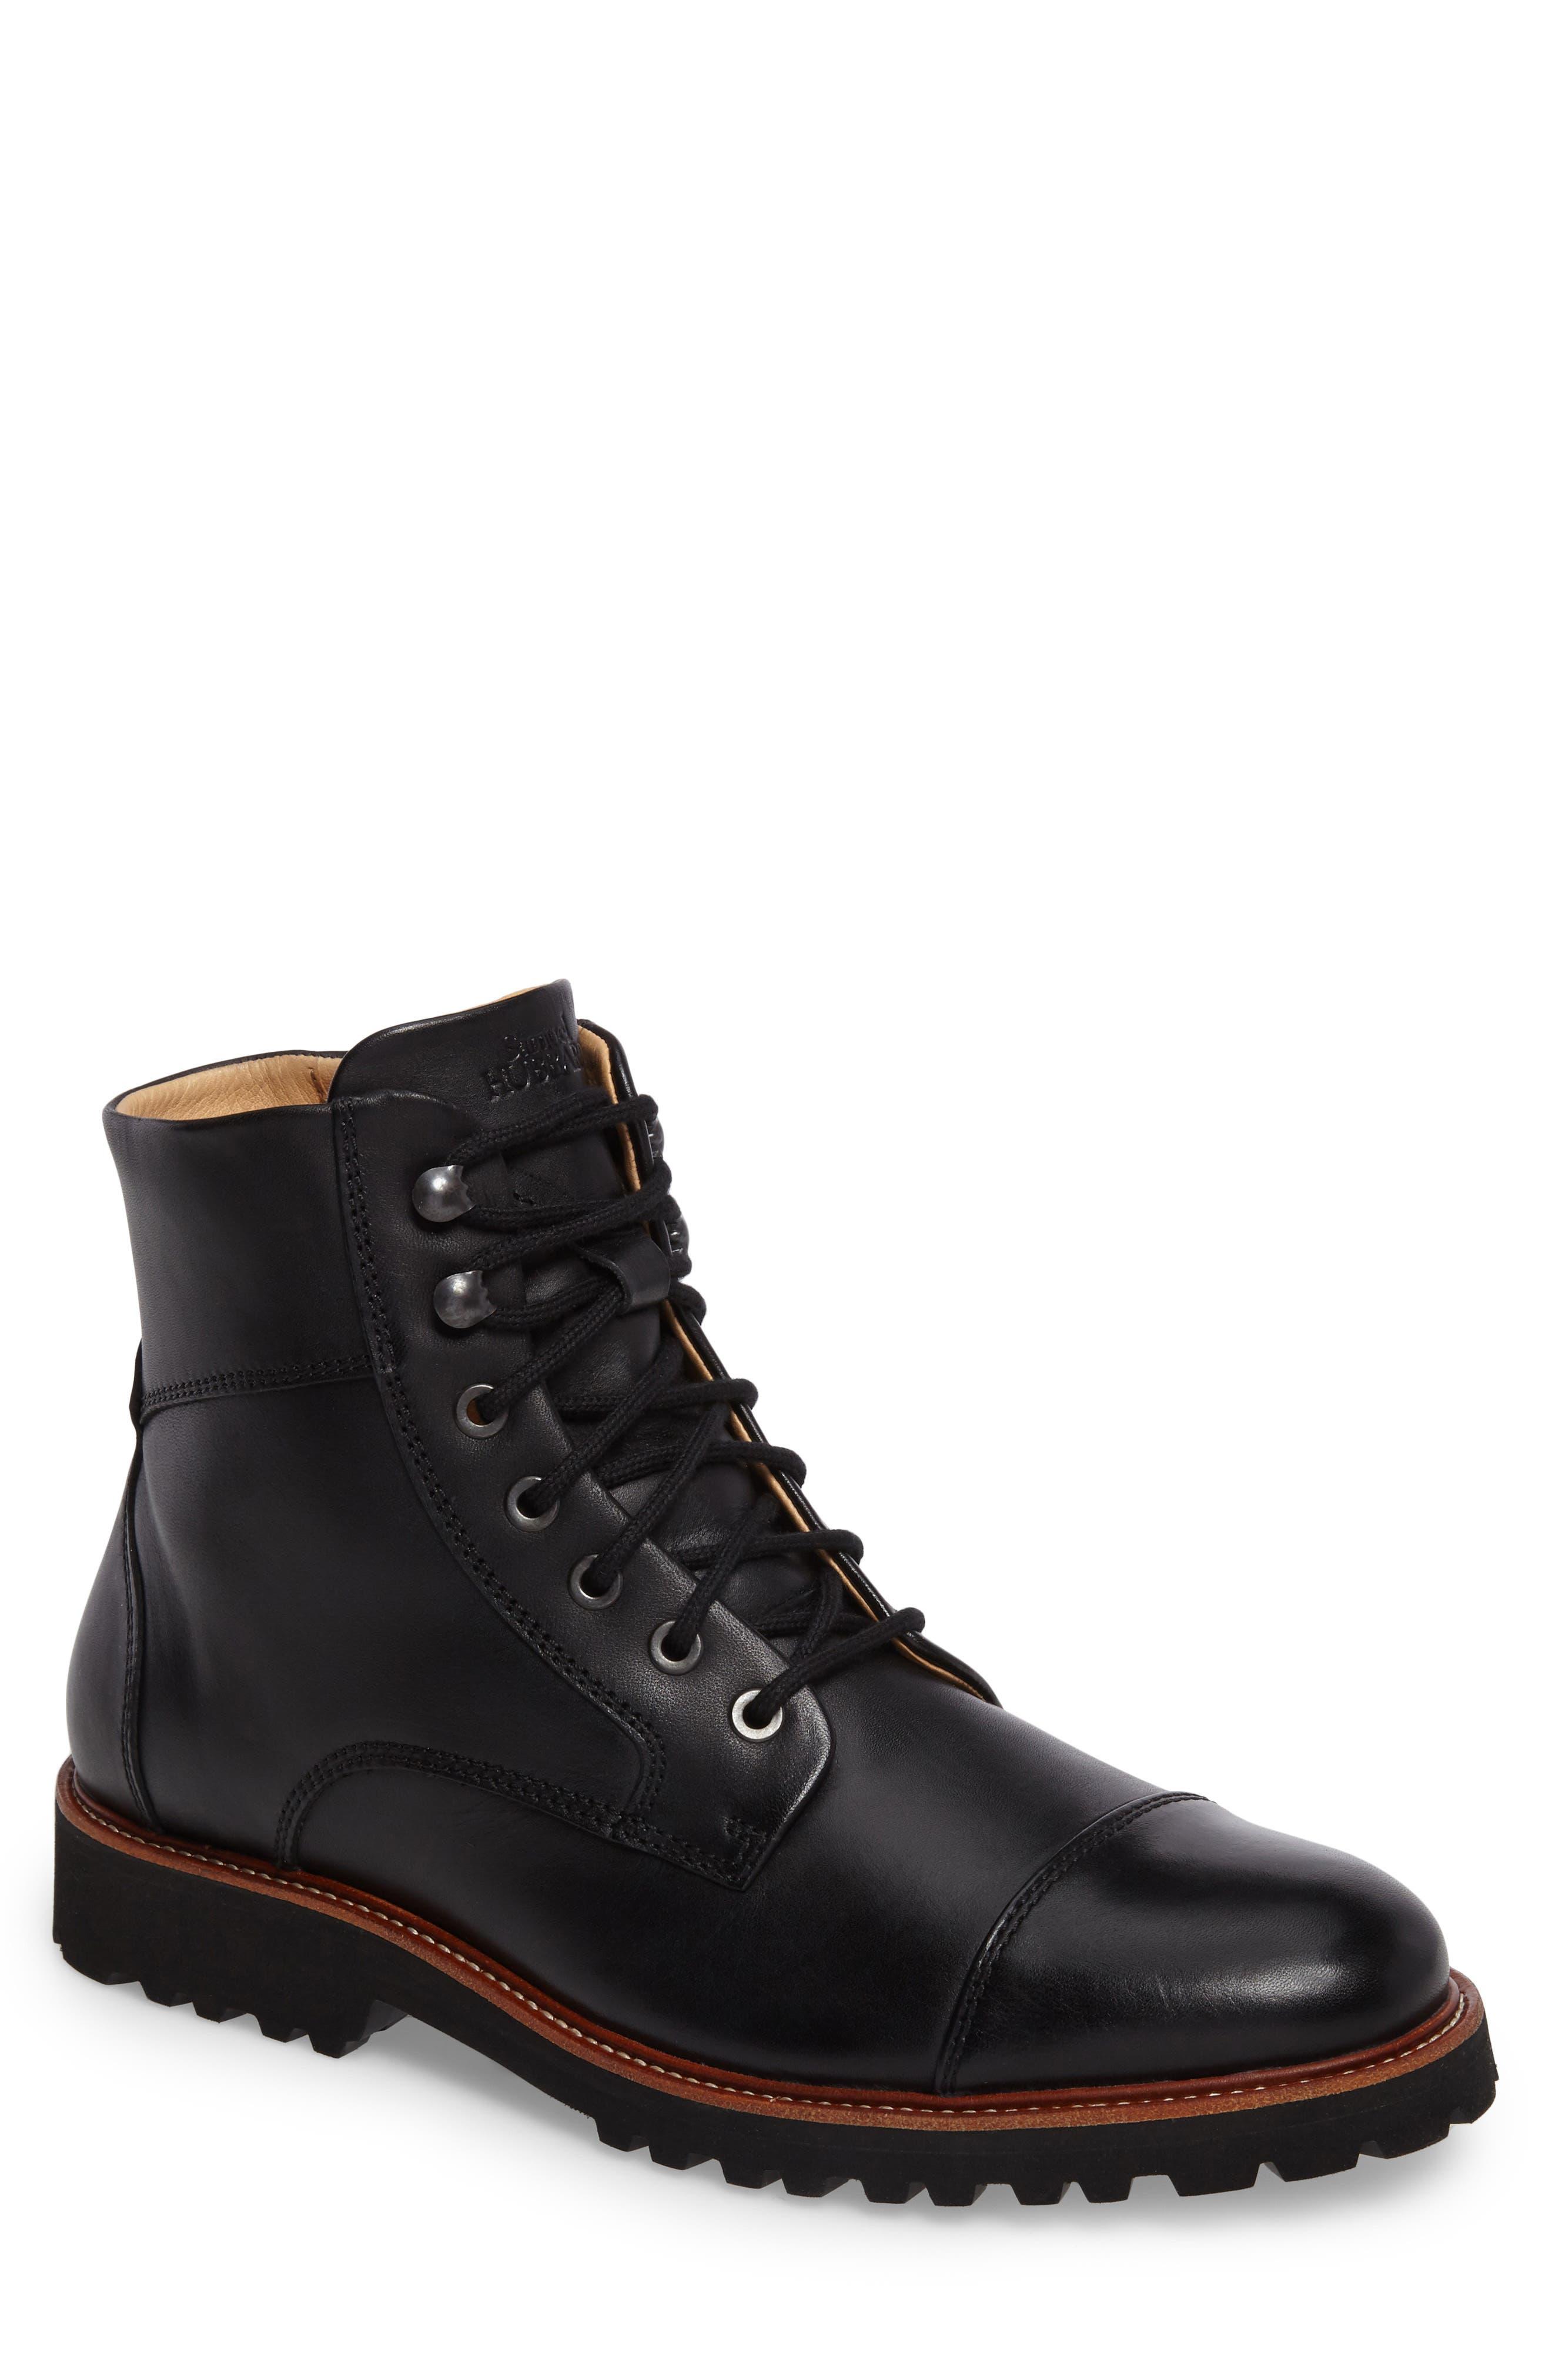 Uptown Maverick Cap Toe Boot,                         Main,                         color, Black Leather